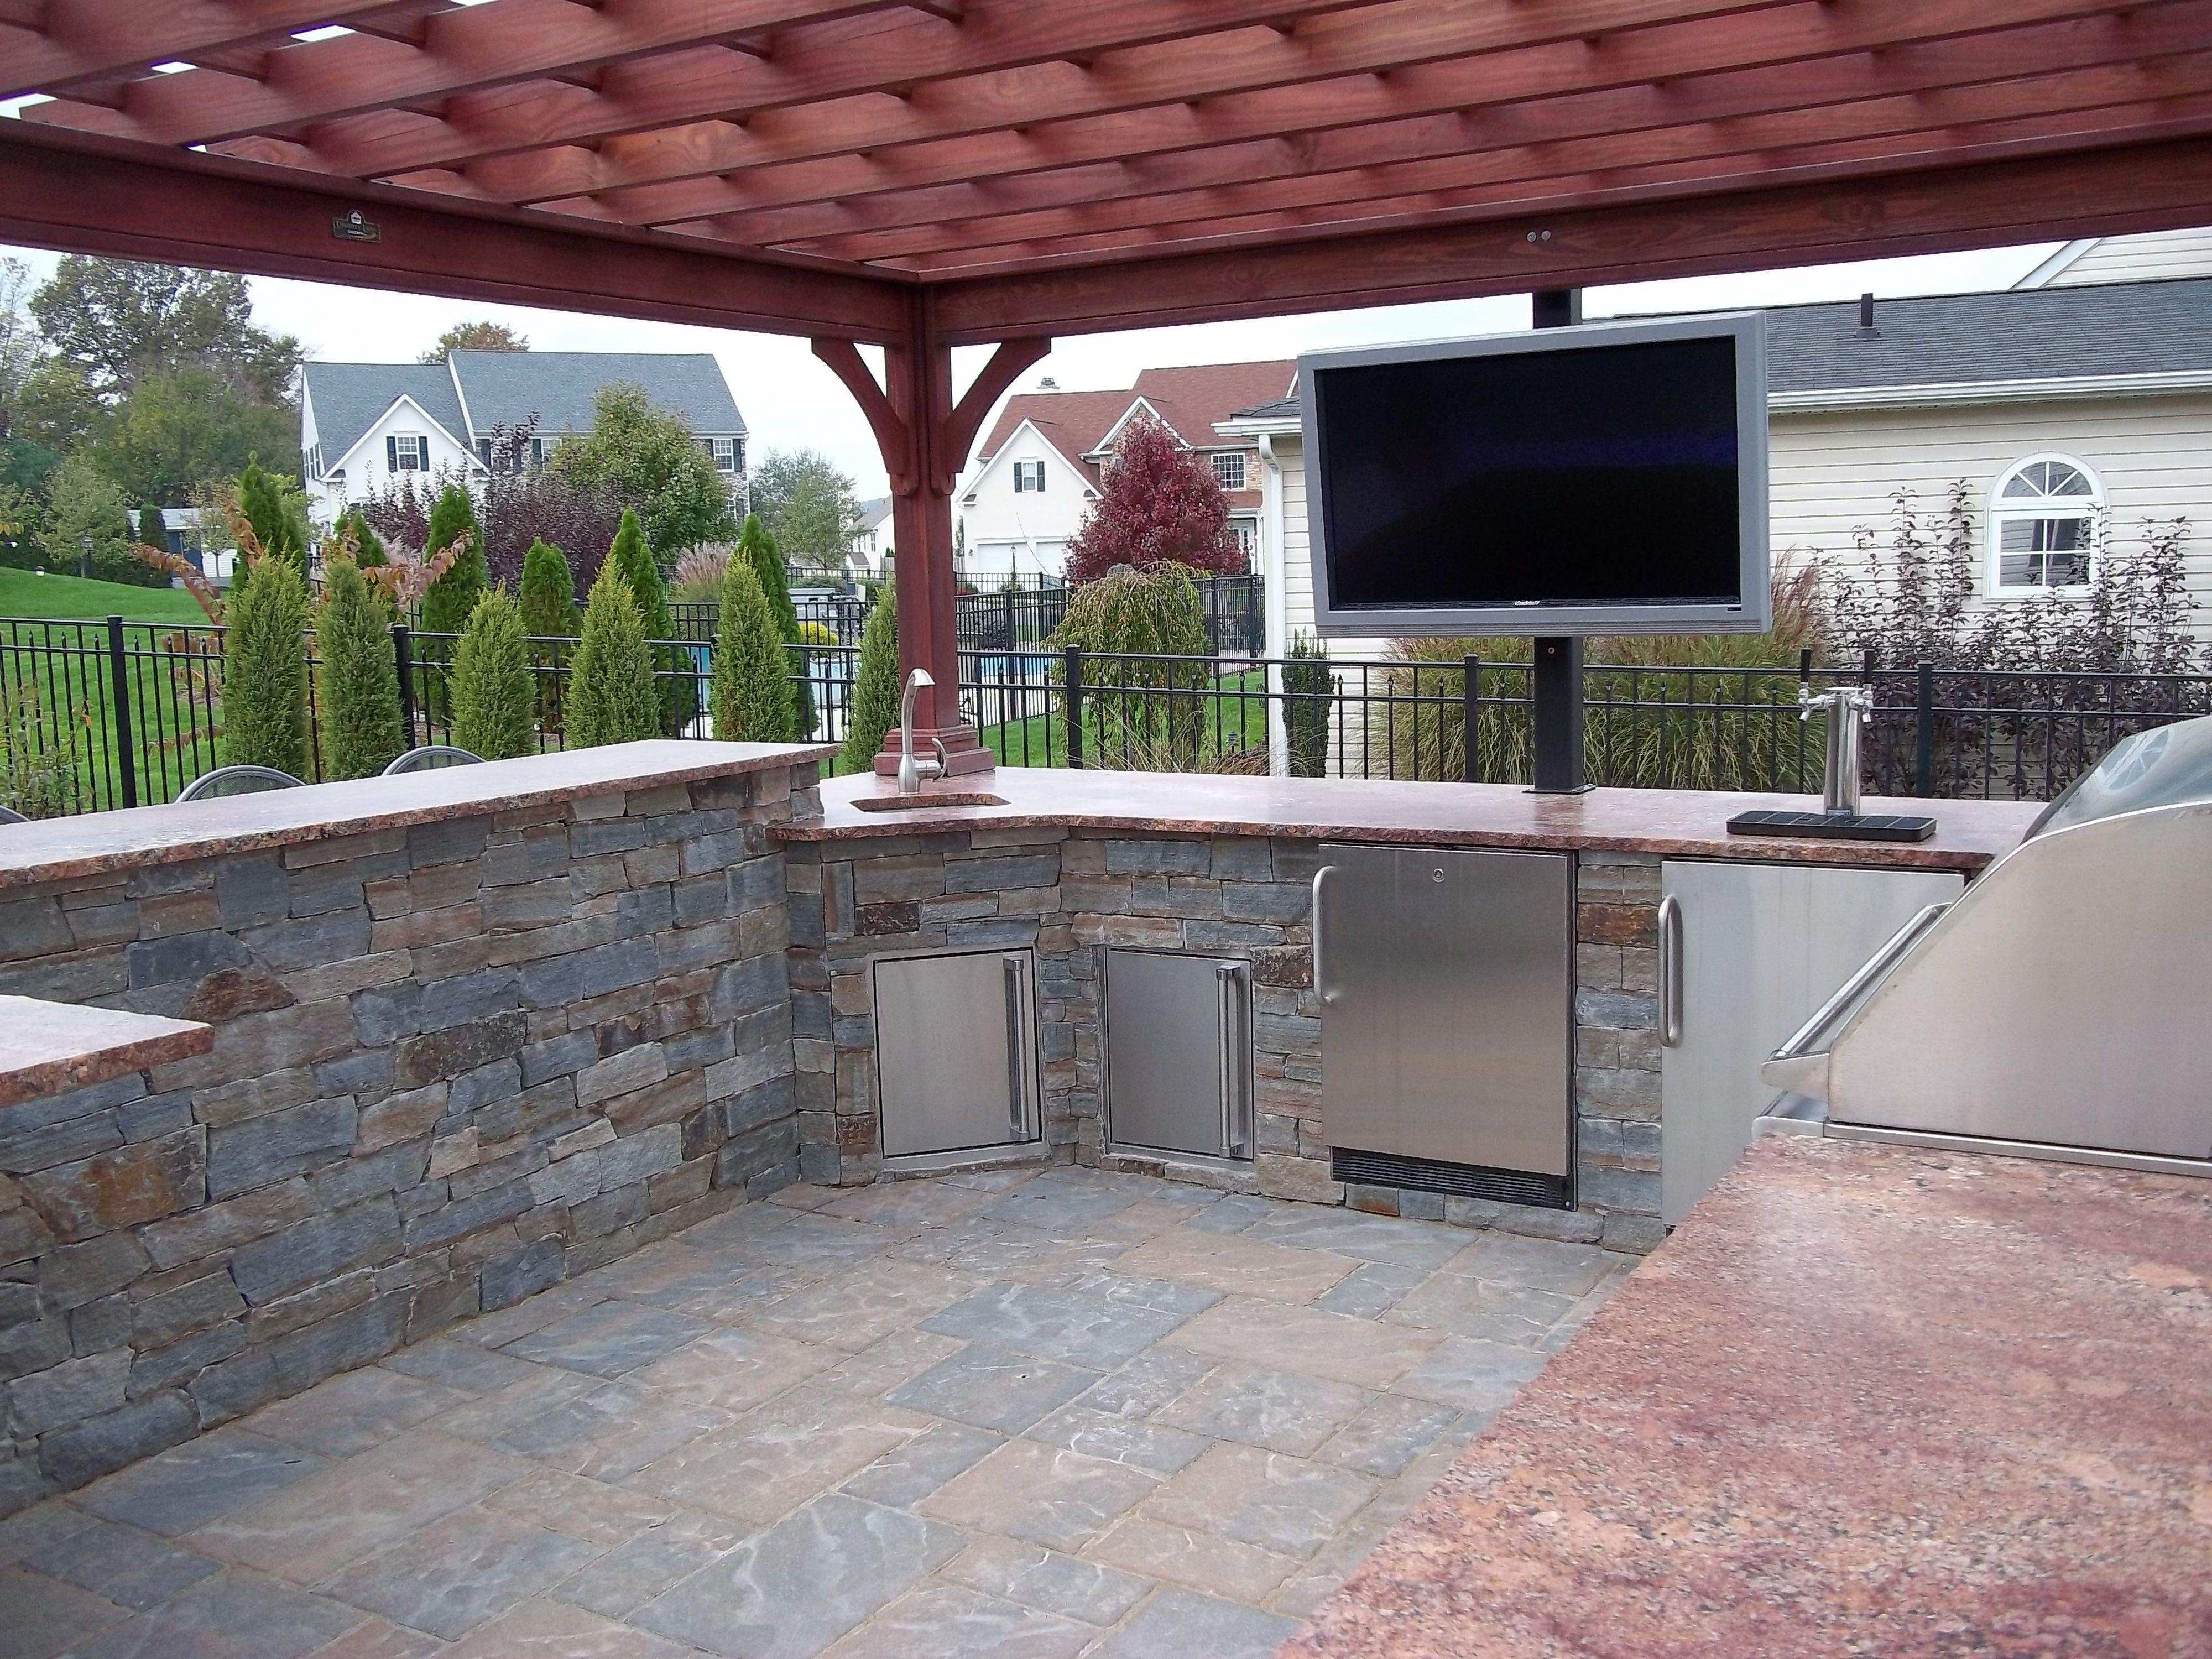 outdoor kitchen grill fridge beer tap and outdoor tv